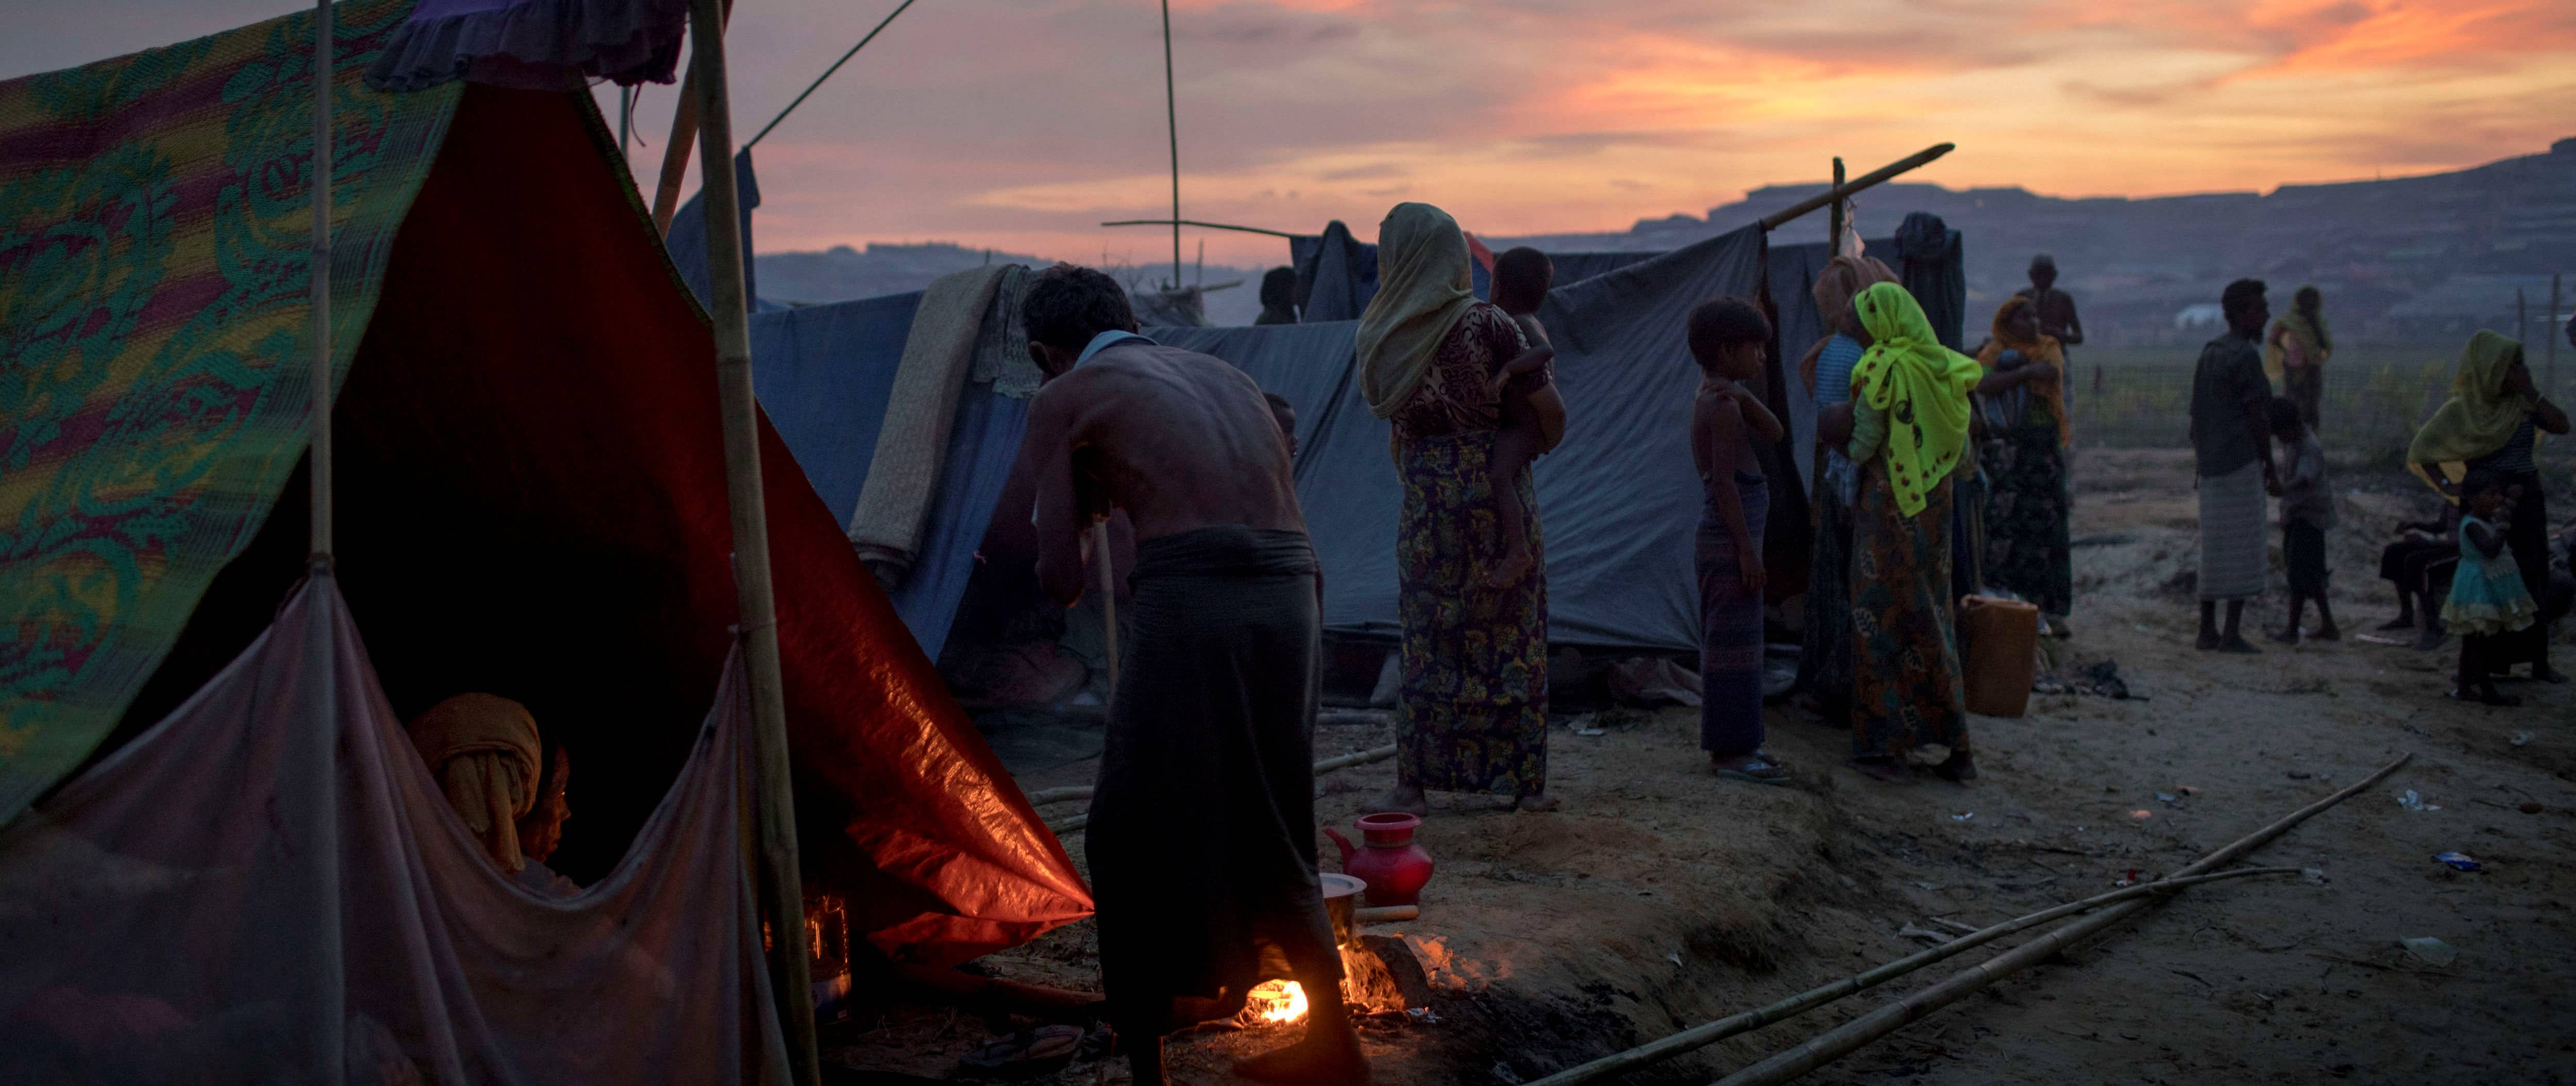 A refugee camp in Bangladesh, September 2017 (Photo: Getty Images/K M Asad)